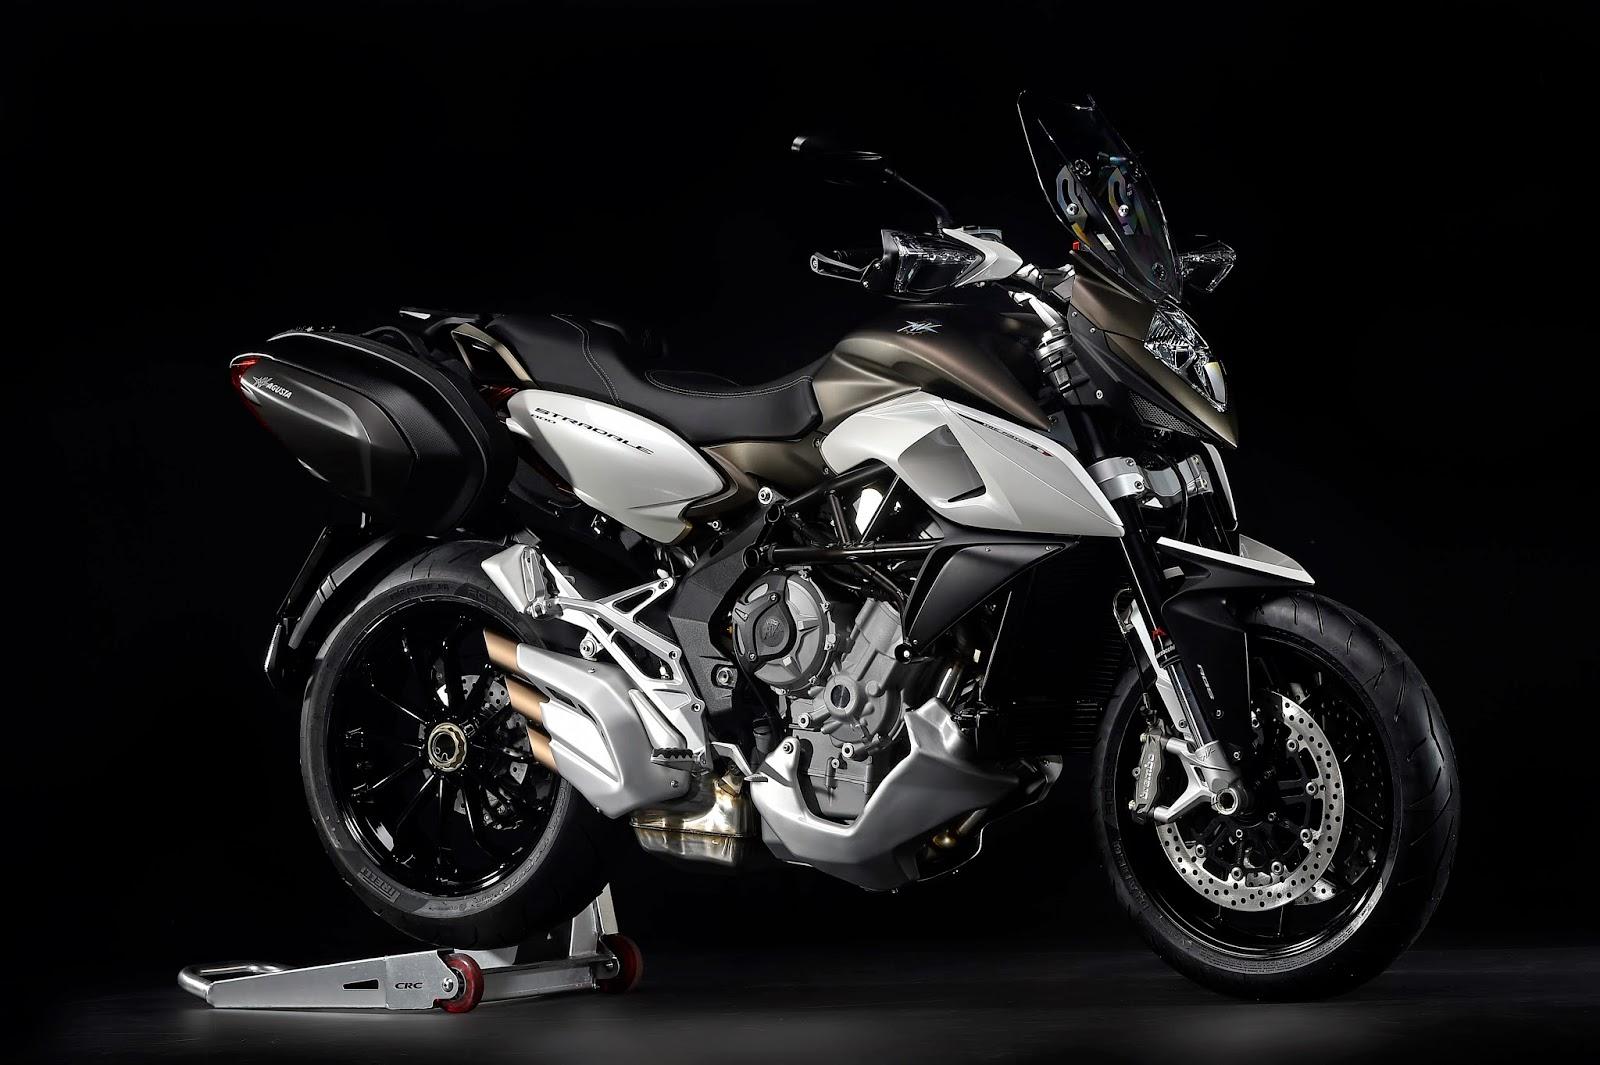 wiring diagram yamaha moto 4 racing caf   mv agusta stradale 800 2015 1 wiring diagram for a yamaha moto 4 350 racing caf   mv agusta stradale 800 2015 1